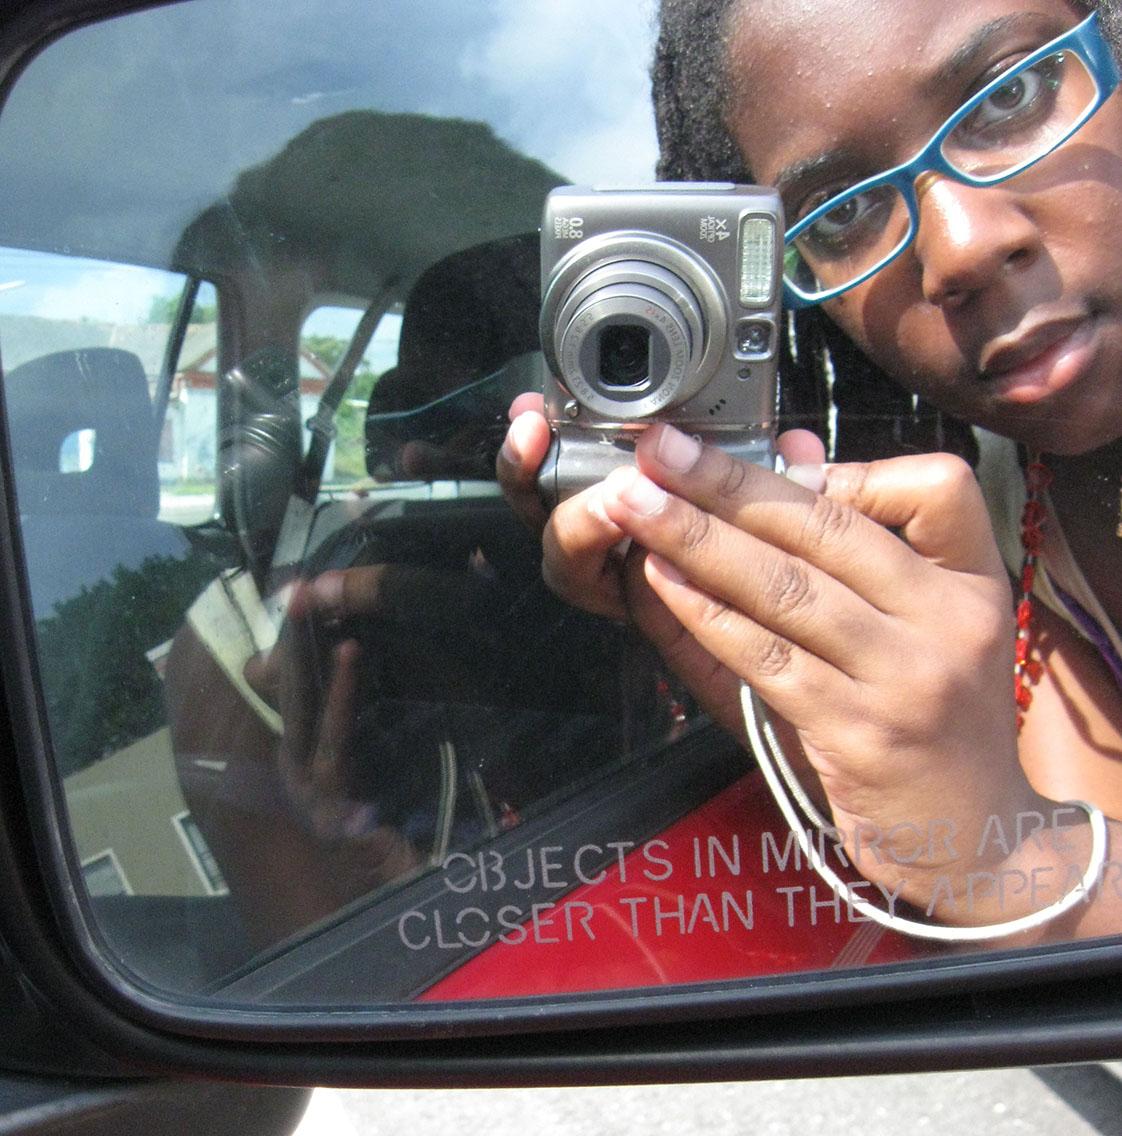 Back in 2009, Zenzele Barnes makes her own self portrait in a mirror.